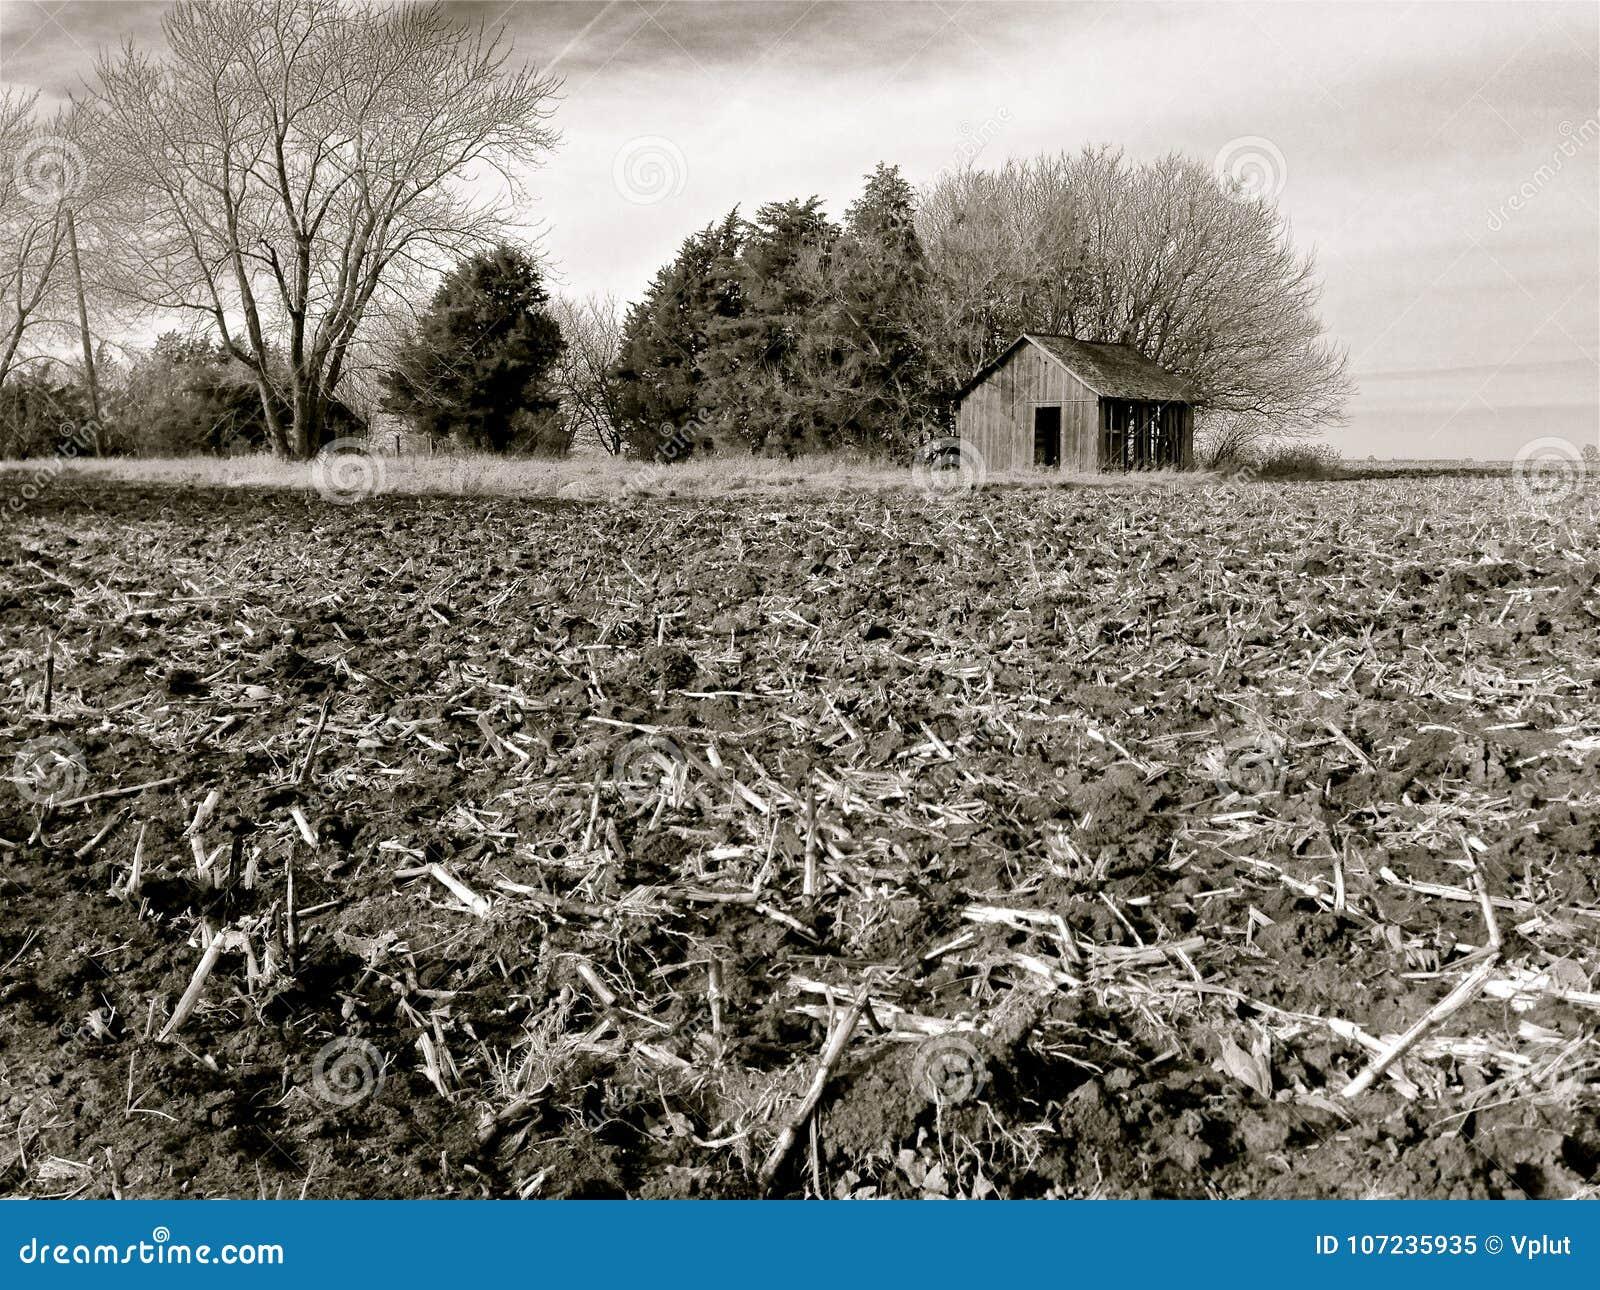 Rich, Black Soil of Illinois Farm Field After Harvest